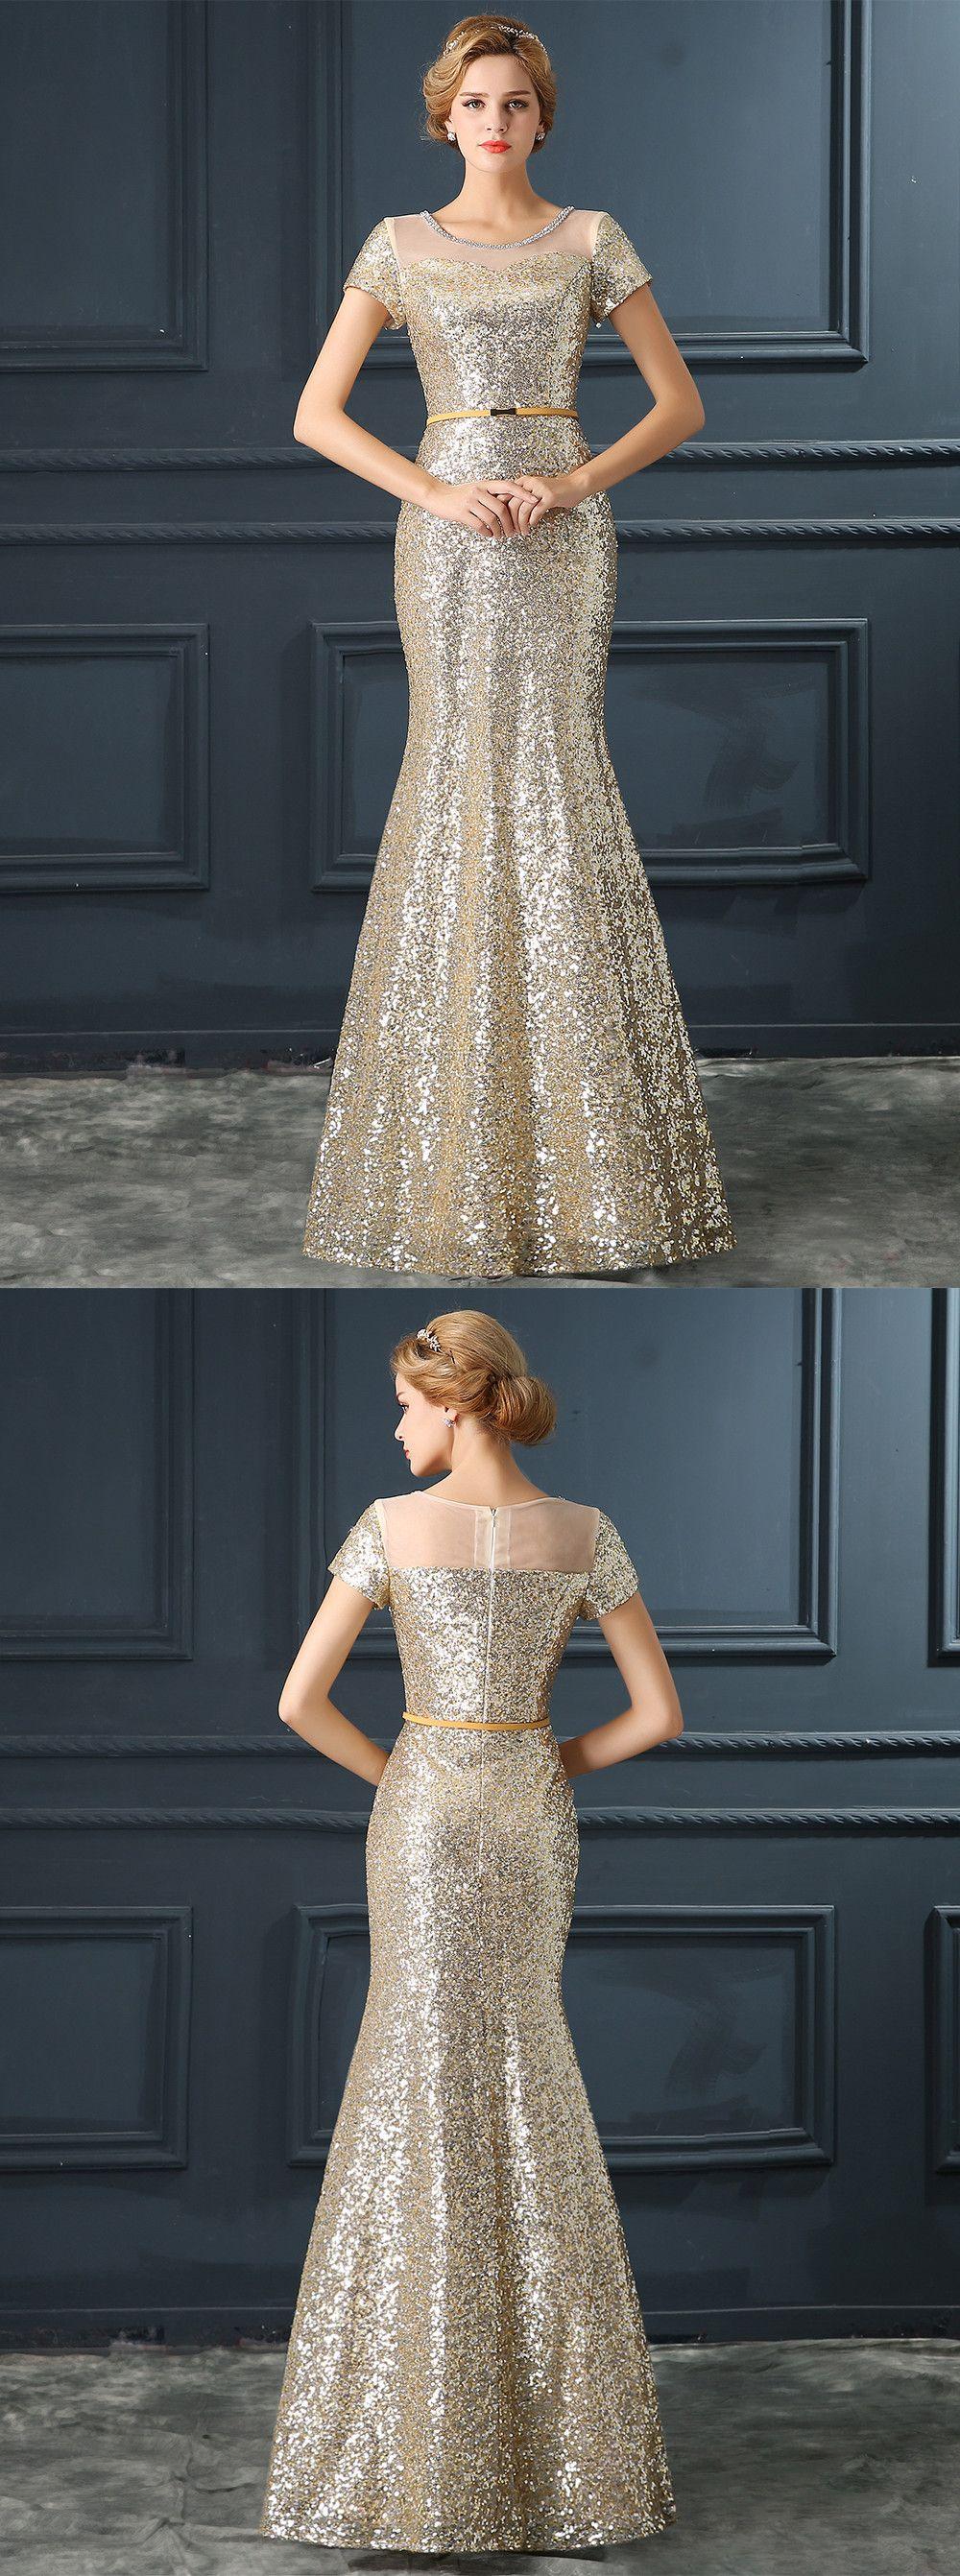 Stunning Jewel Short Sleeves Floor- Length Sequined Mermaid Prom ...